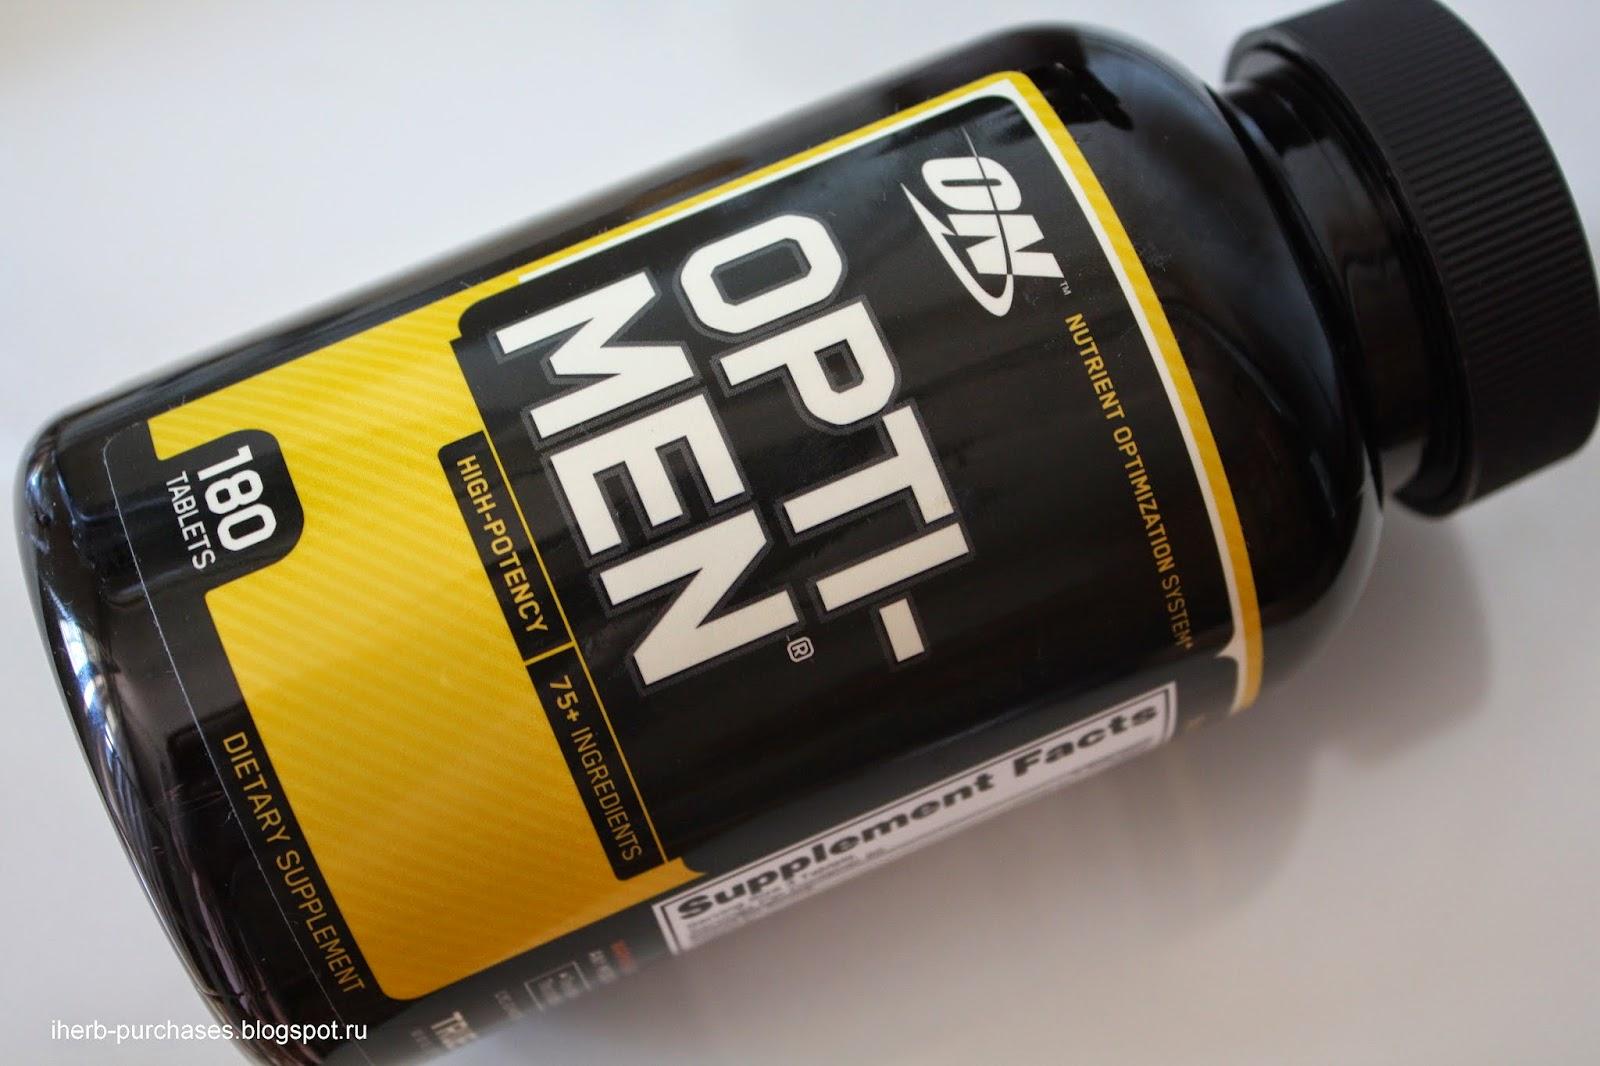 витамины для мужчин, спортивное питание, отзыв, iherb